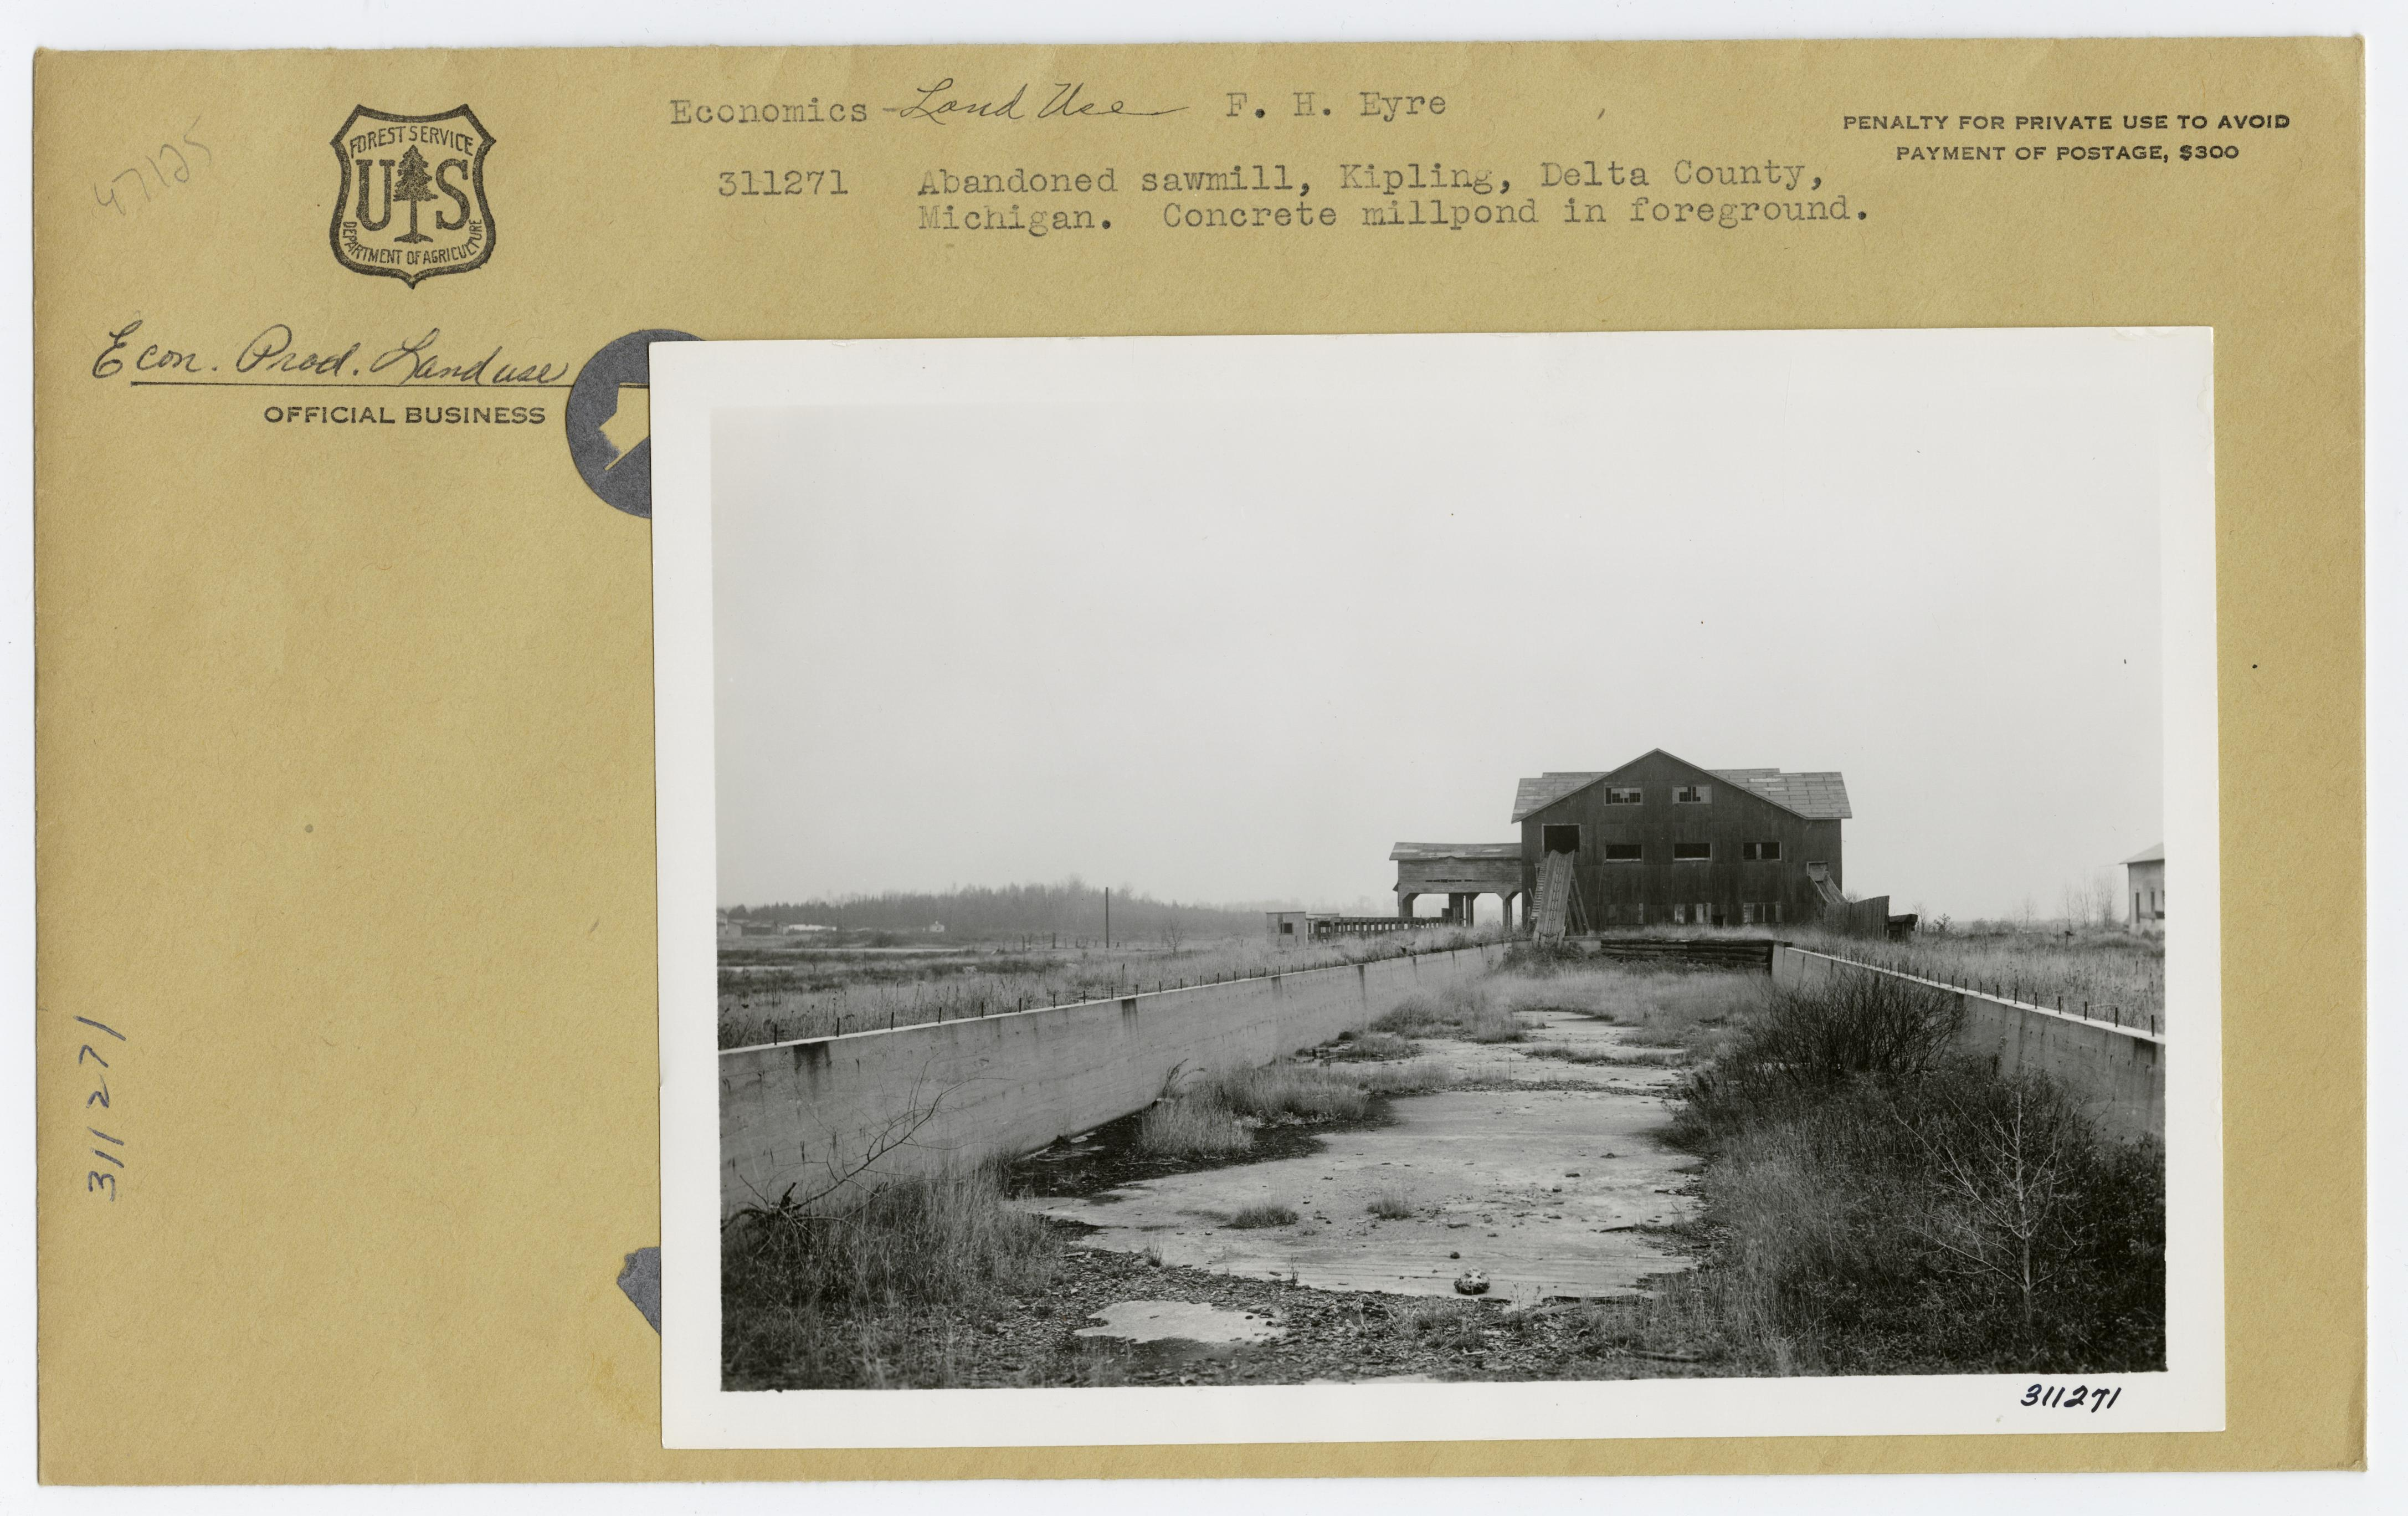 Pulp & Paper Mills - Abandoned Pulp/Paper Mill